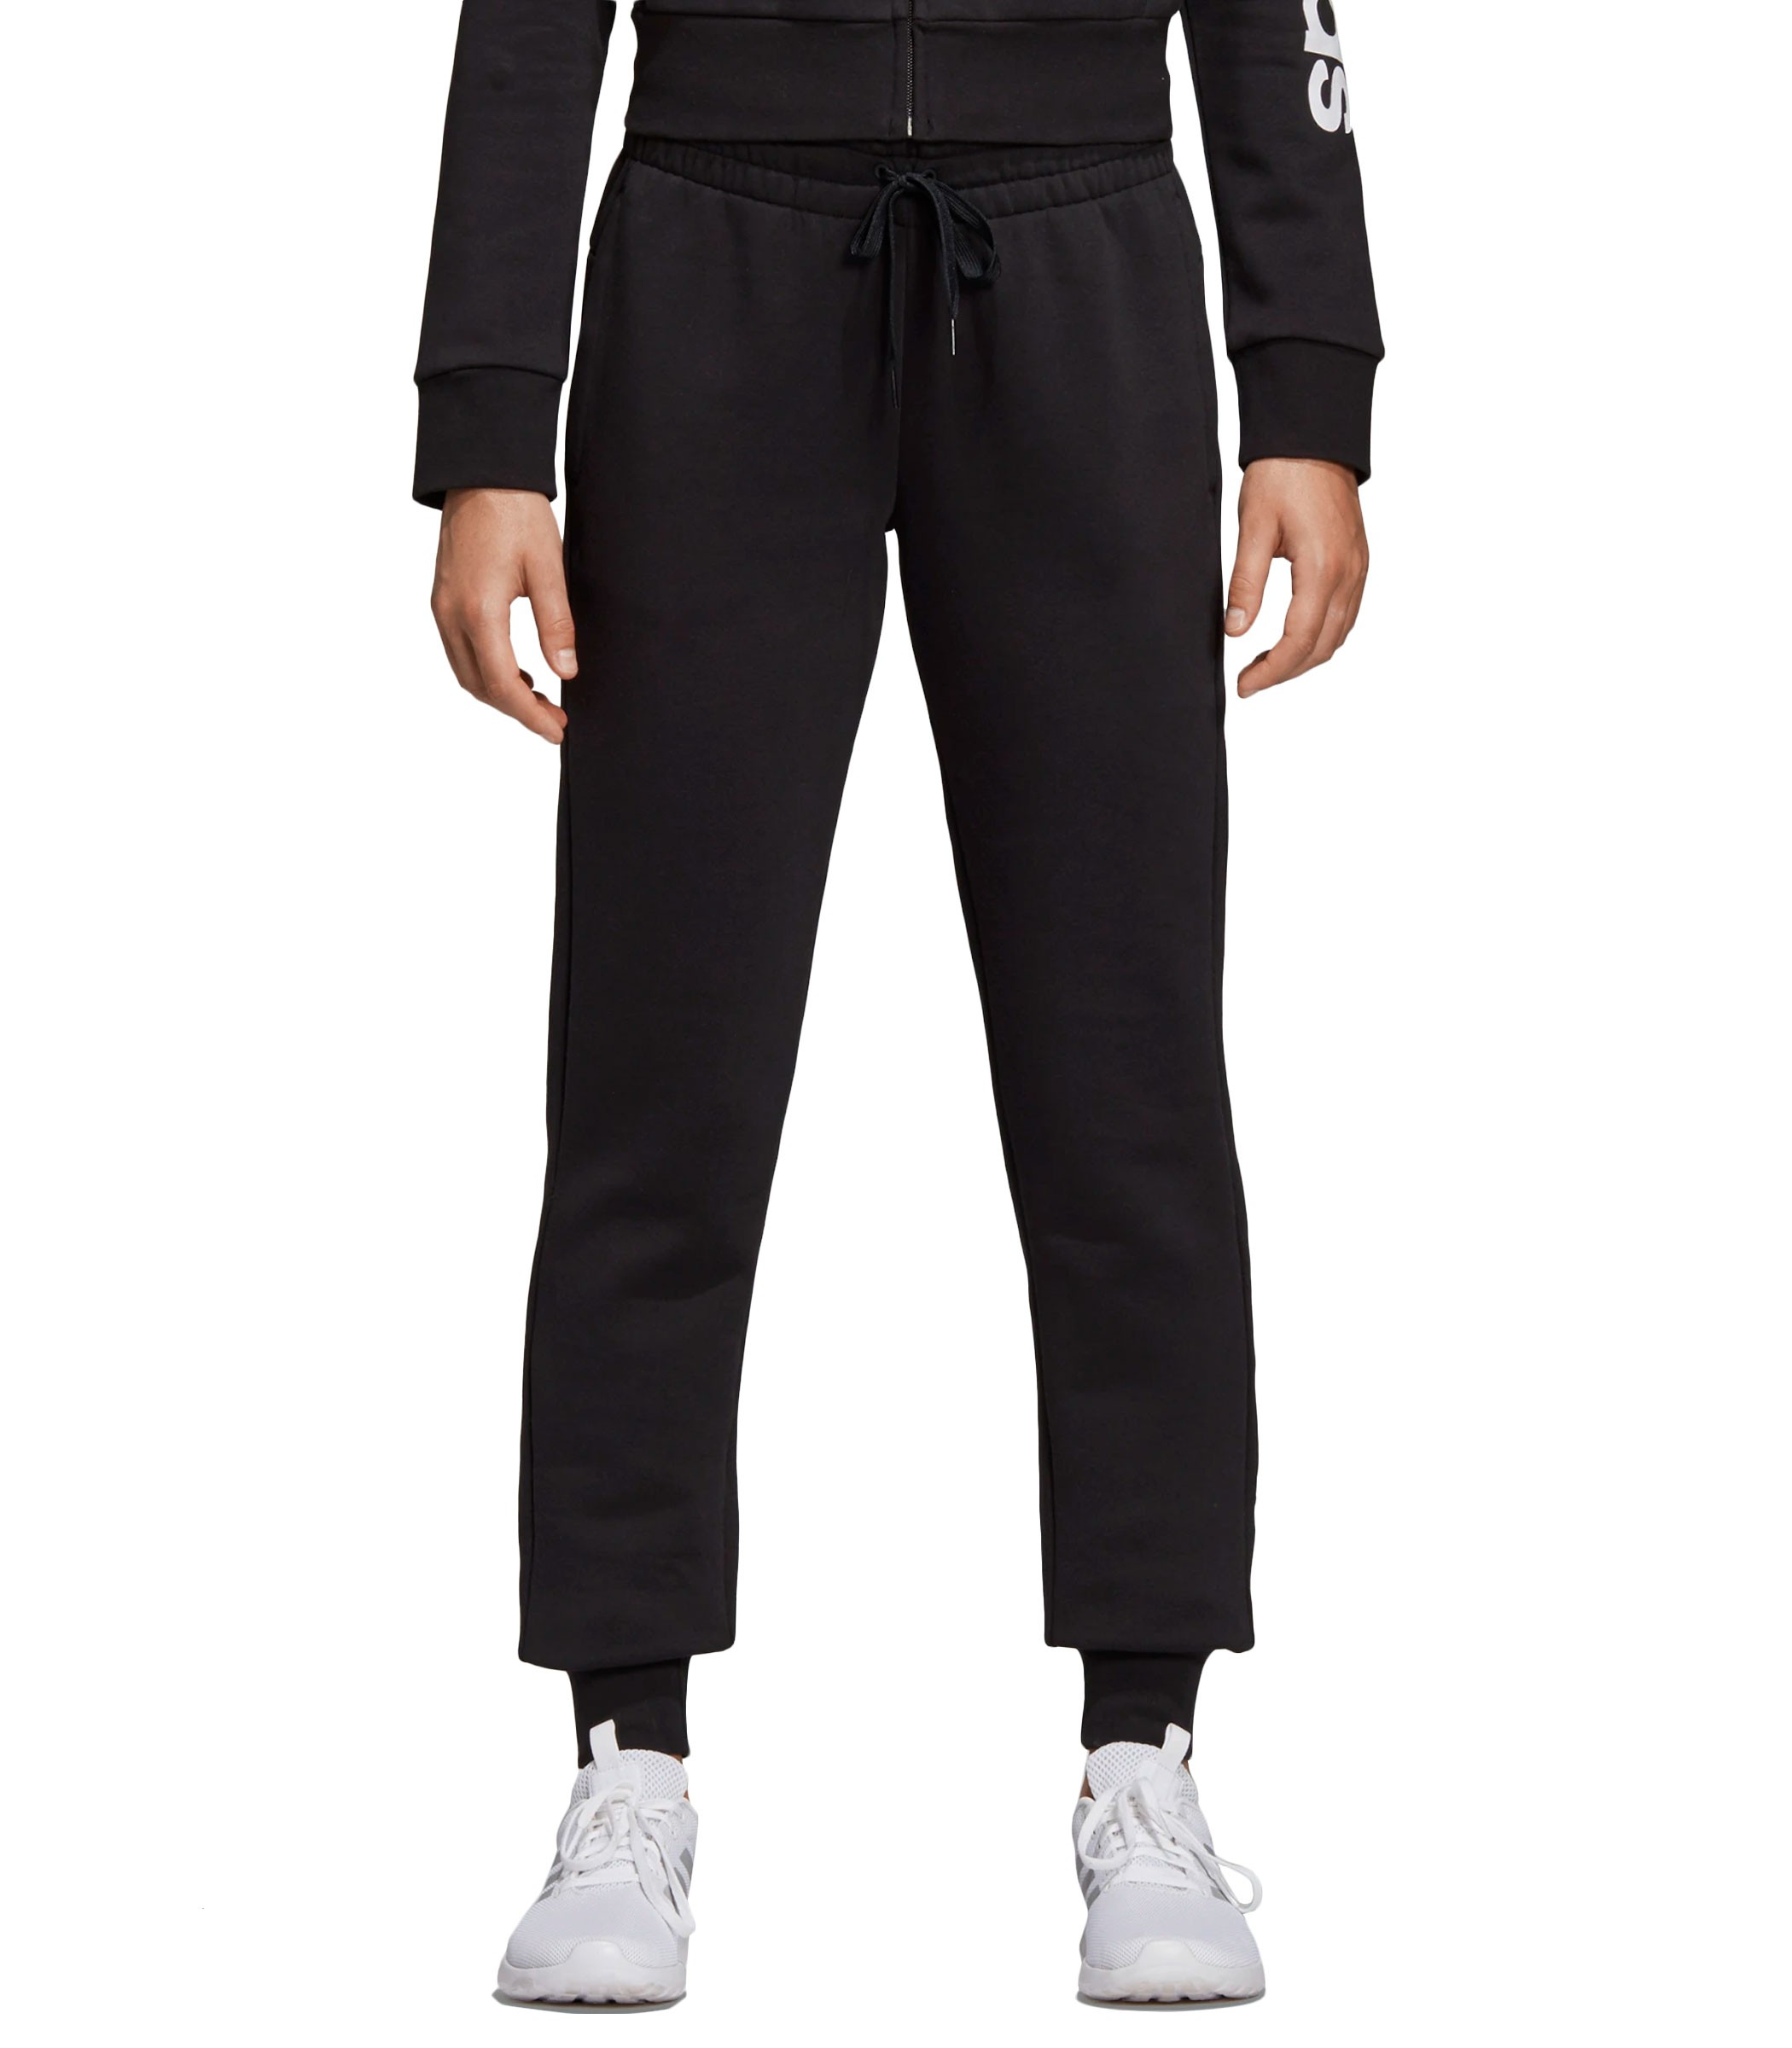 Pantaloni tuta Adidas con stampa Essentials Linear Pants ...